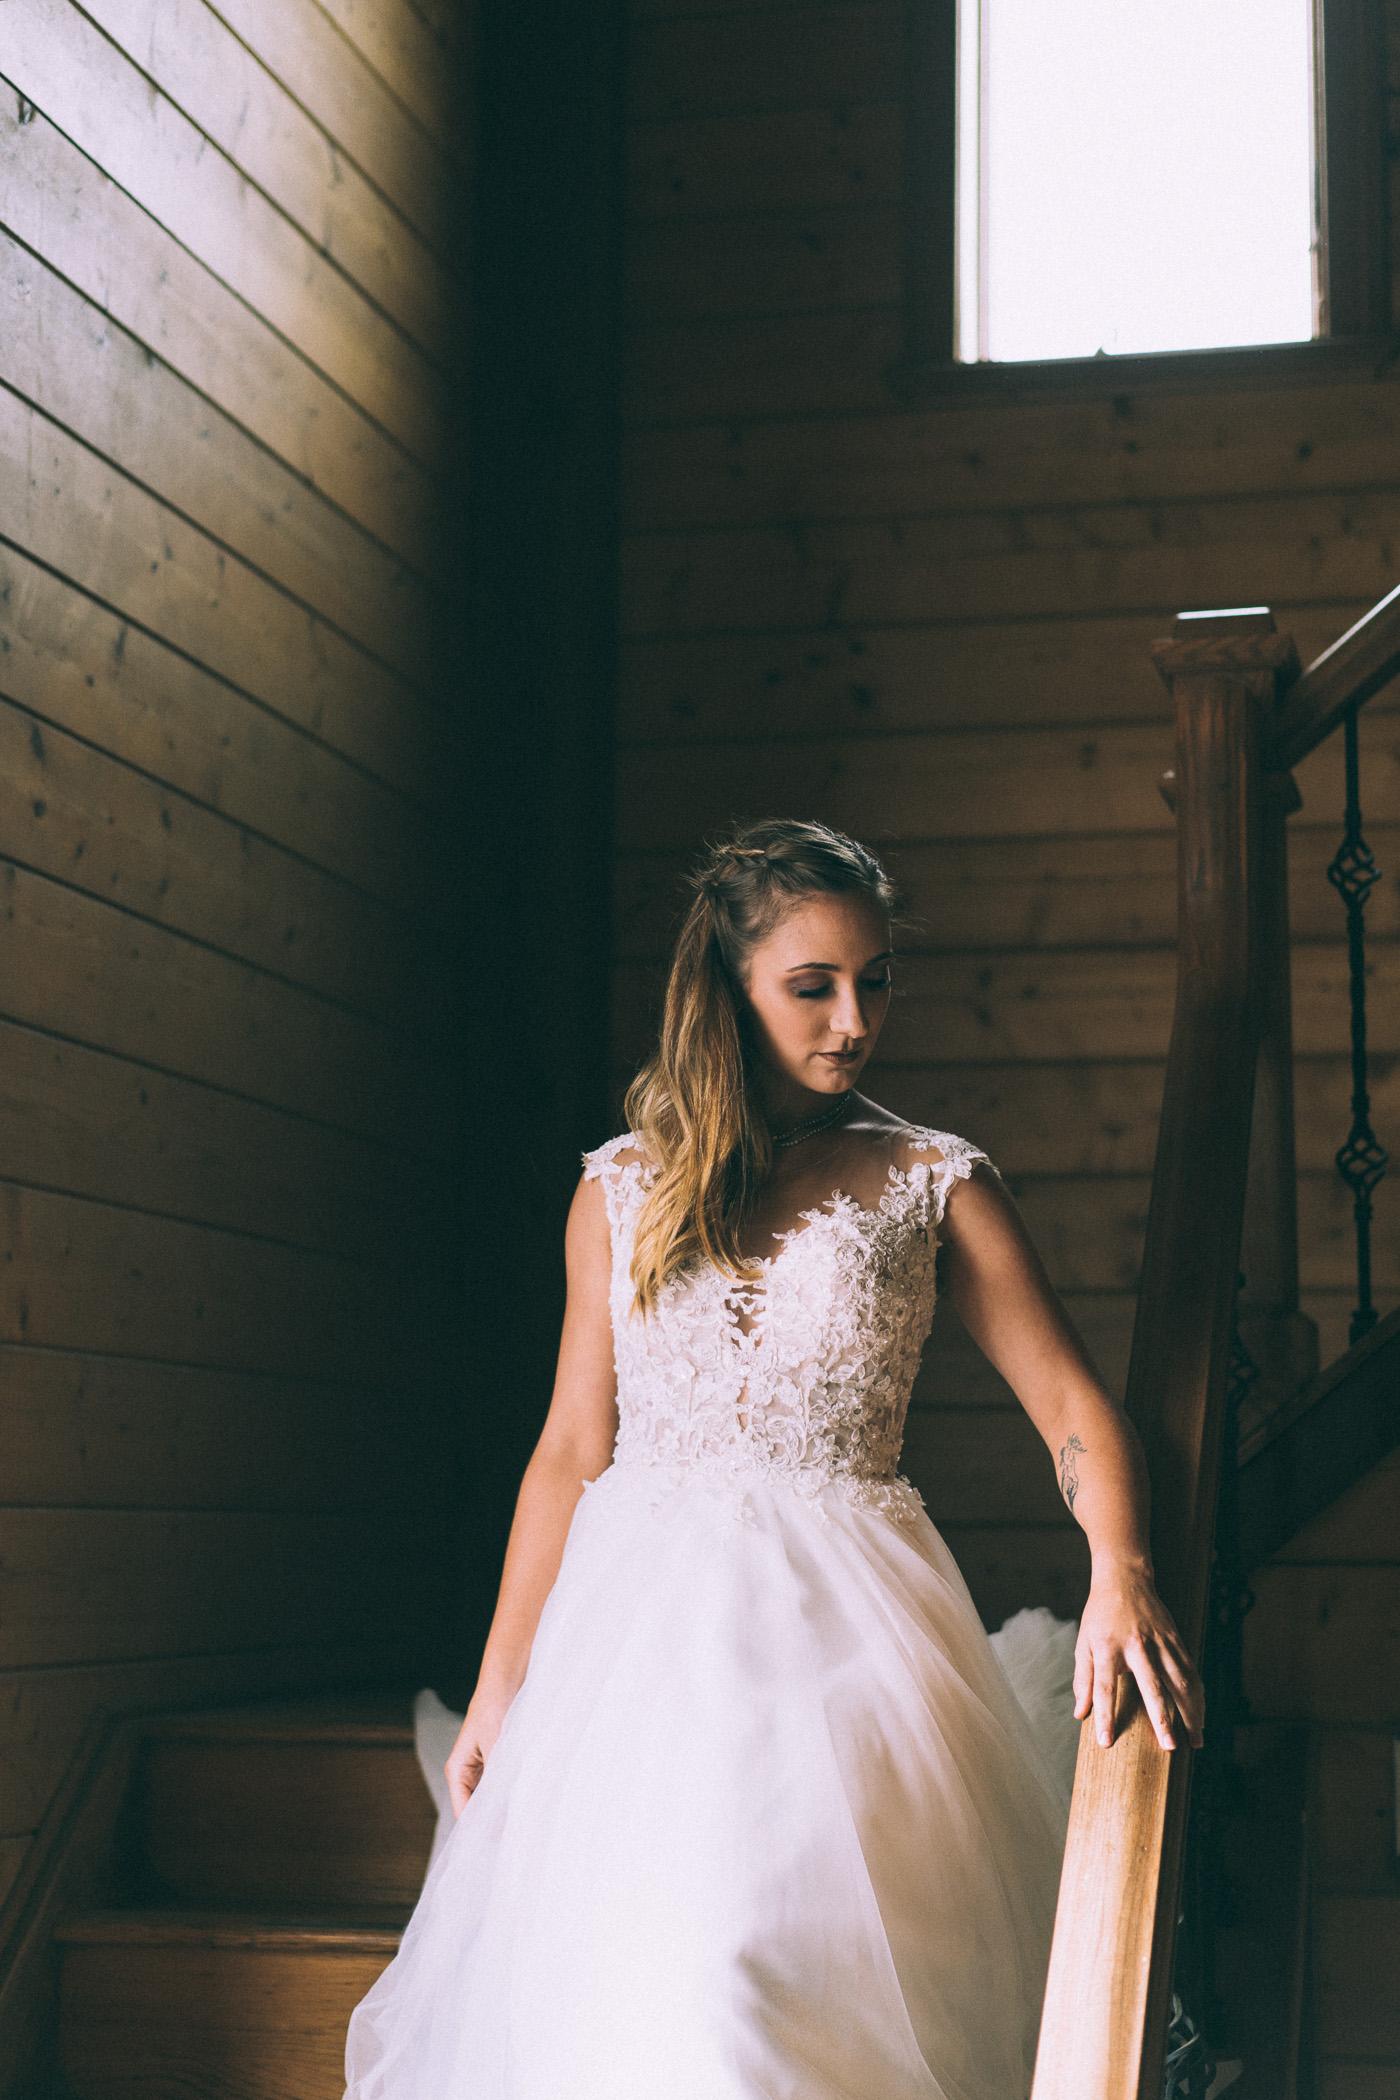 18-Faux Wedding-brandon shane warren-127.jpg